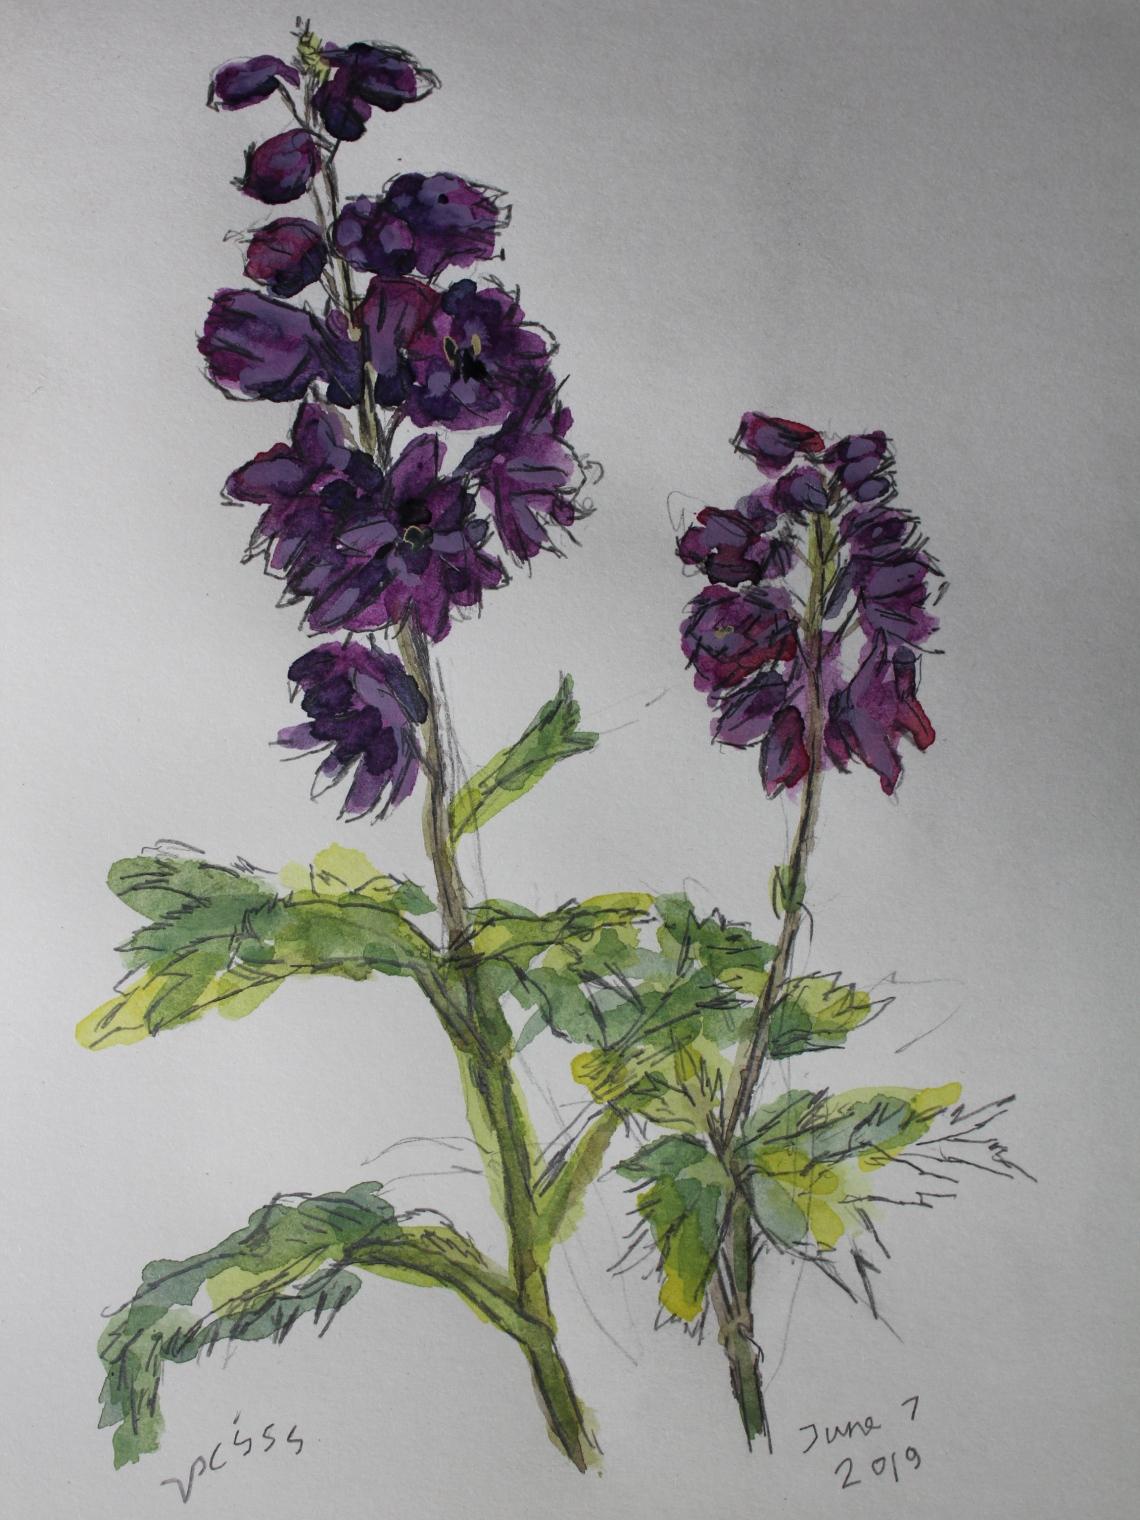 delphiniumish flowers